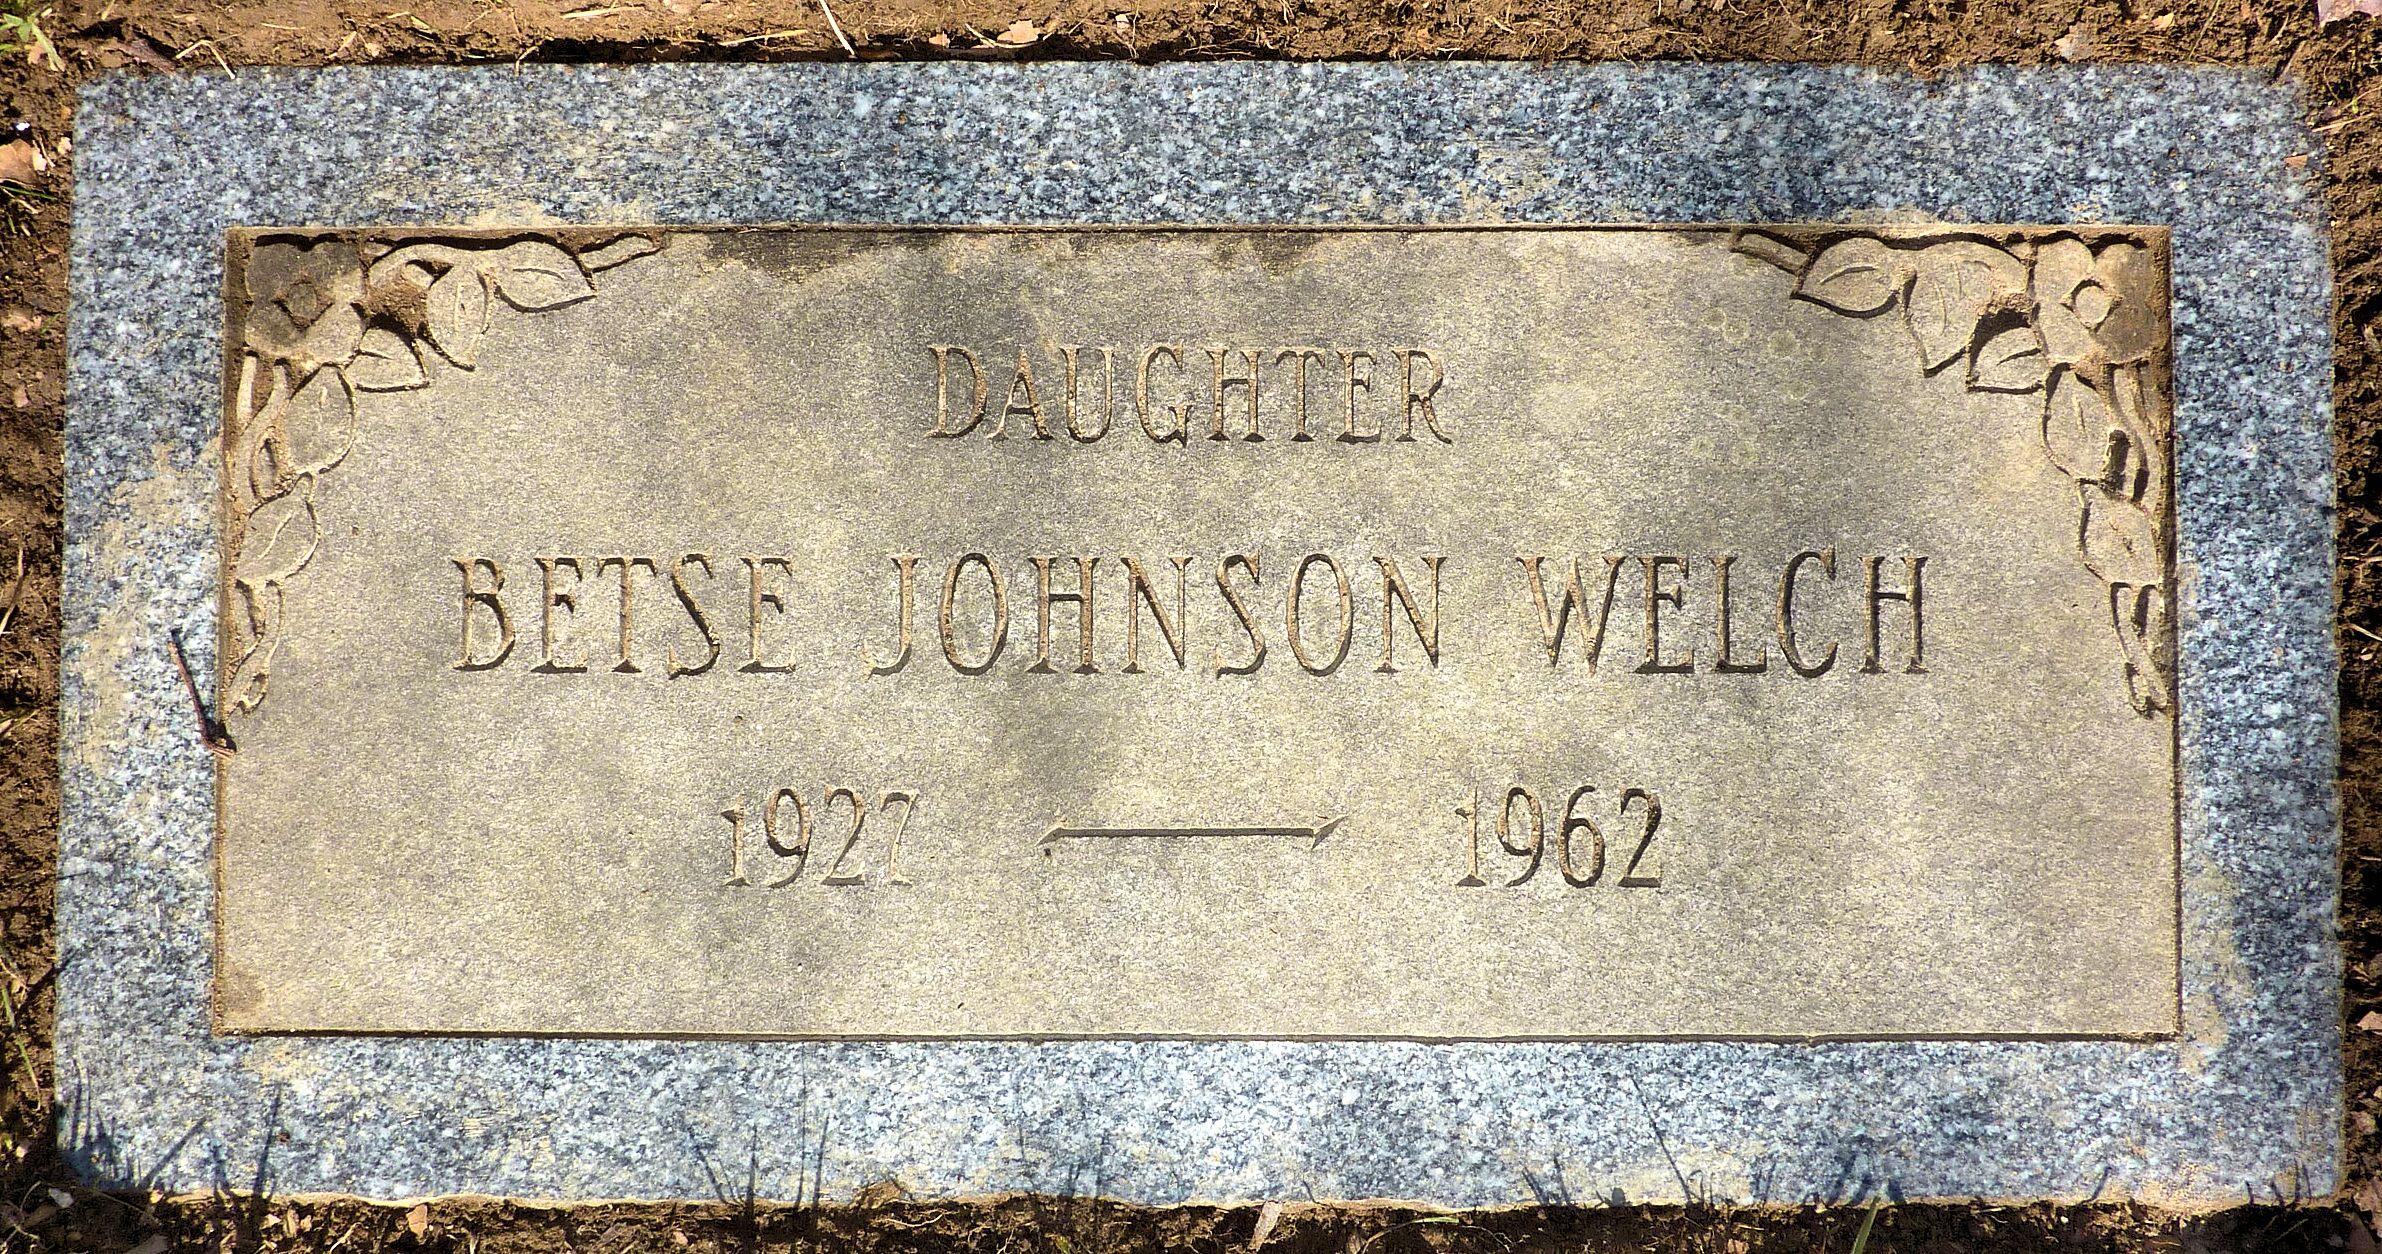 Betse Brown Betsy <i>Johnson</i> Welch